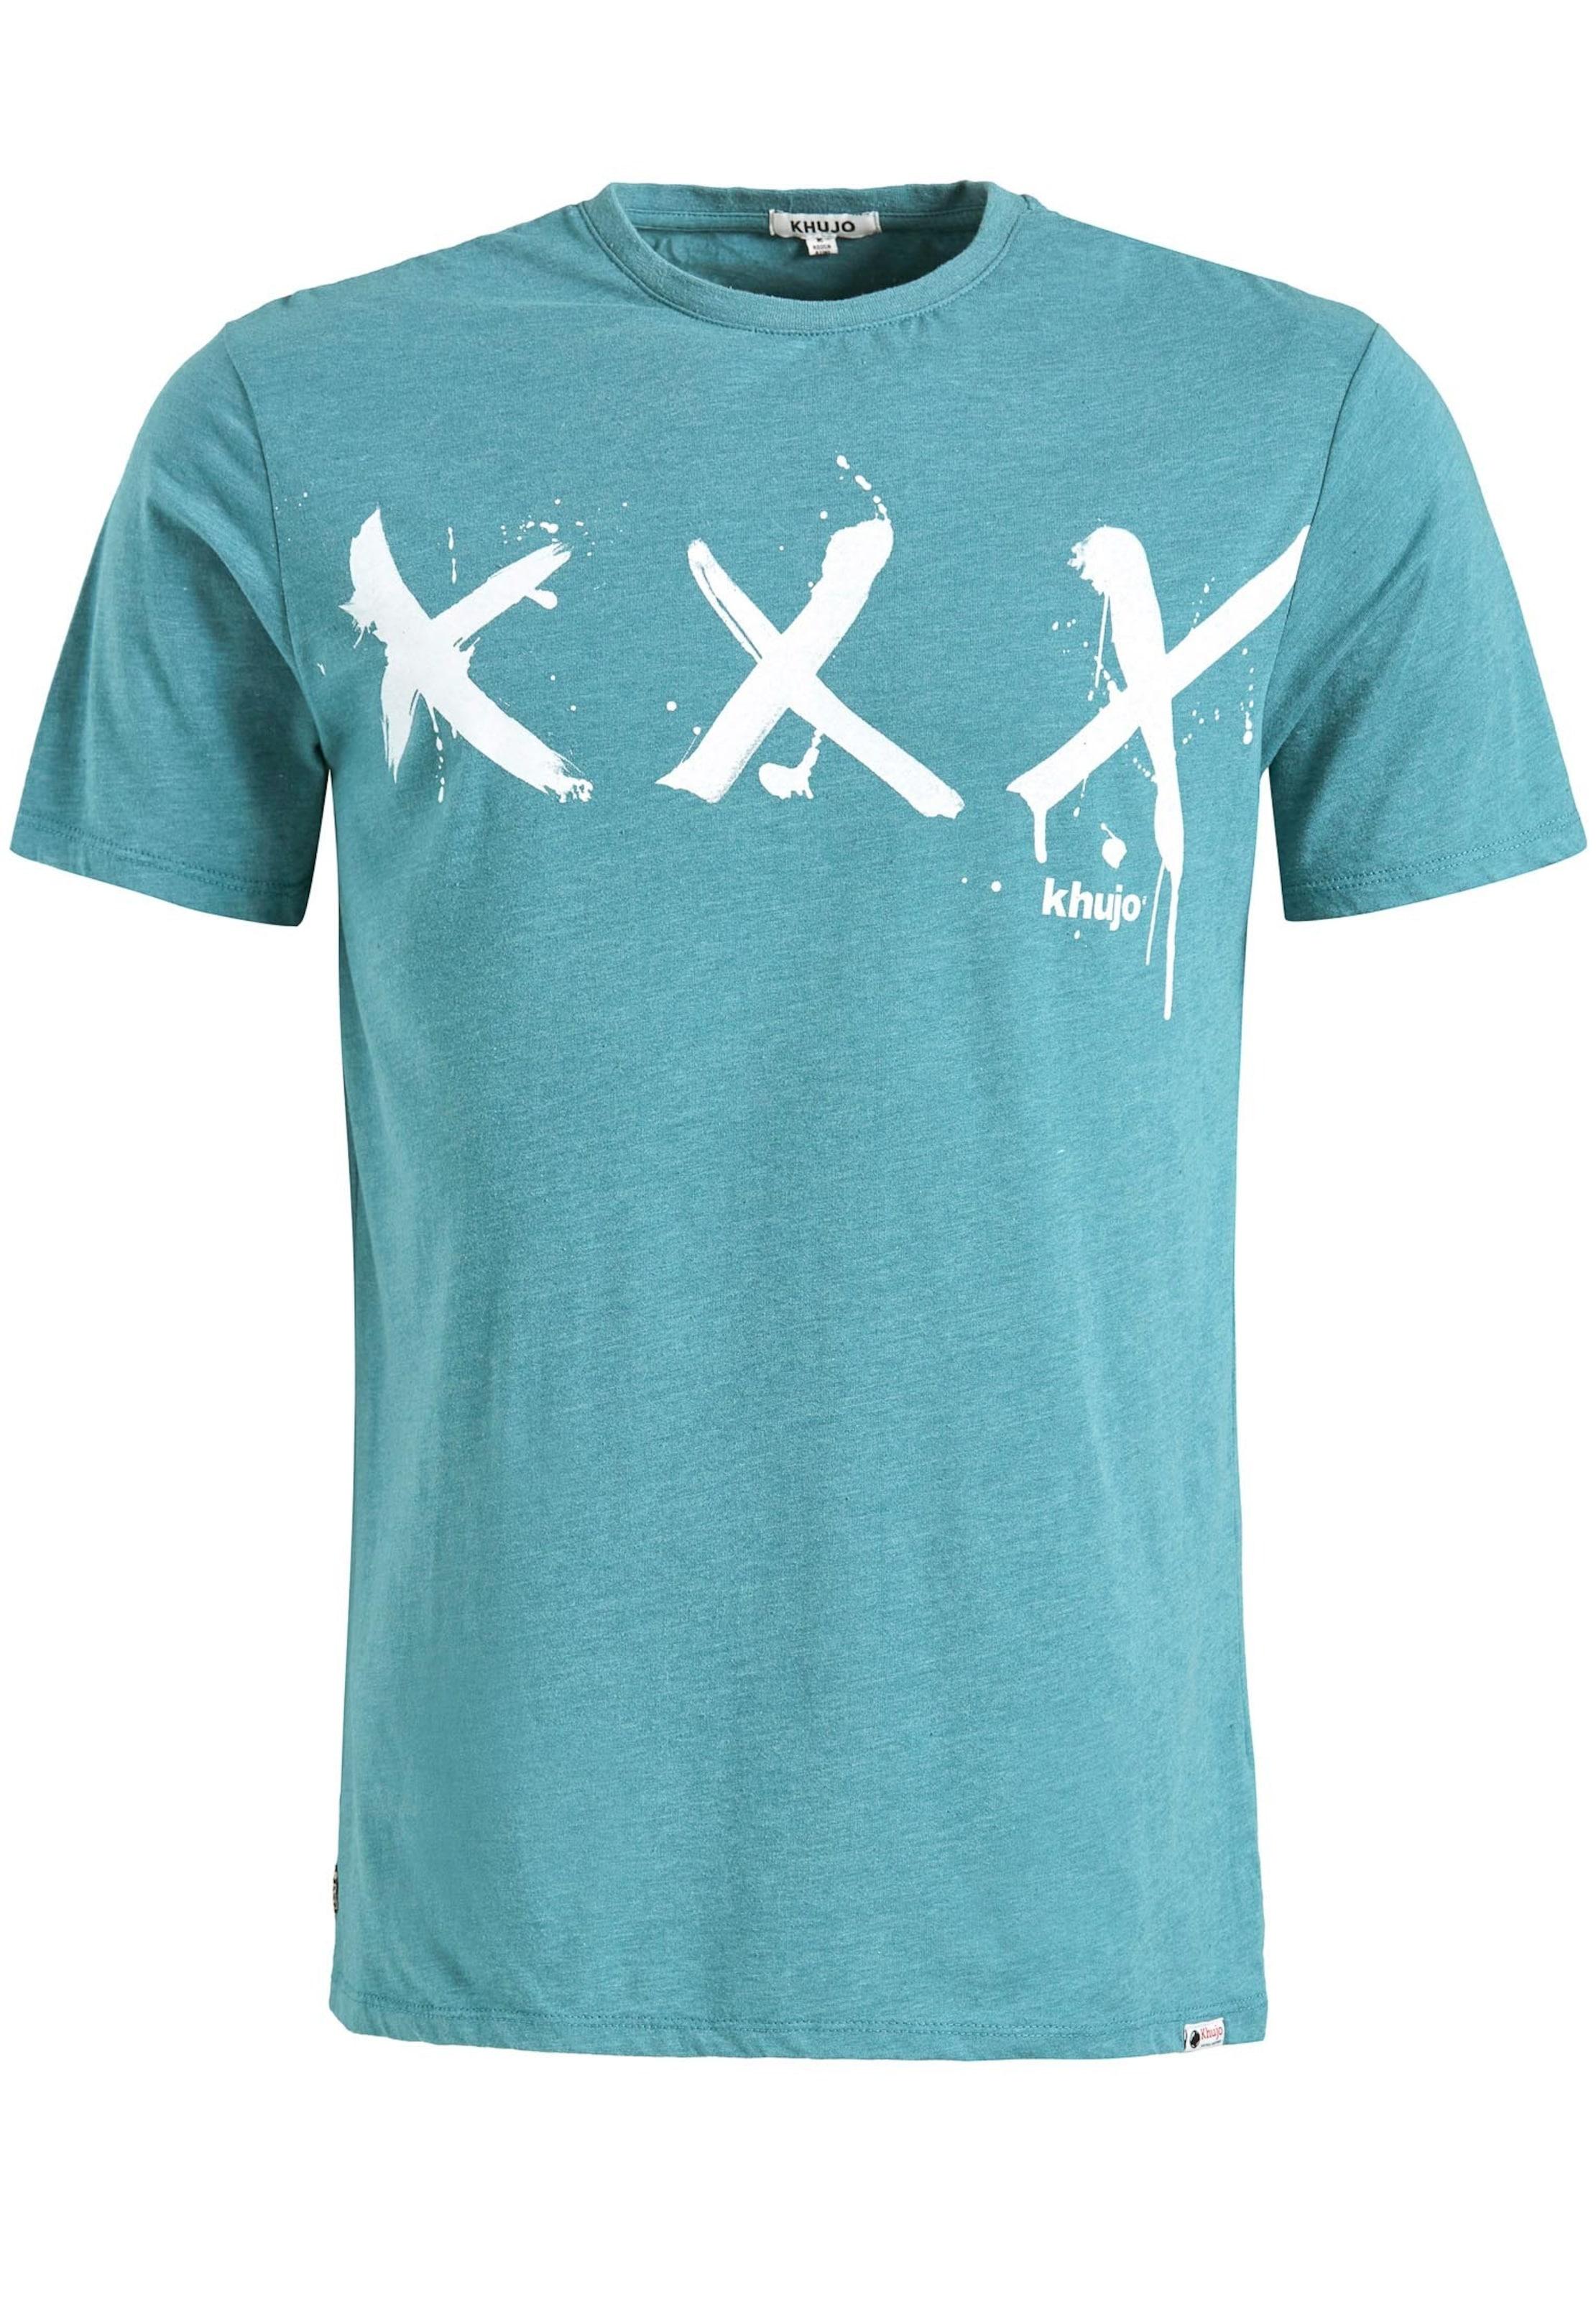 Jade shirt T Khujo 'uslo Blanc Tripplex' En f6wHOWH